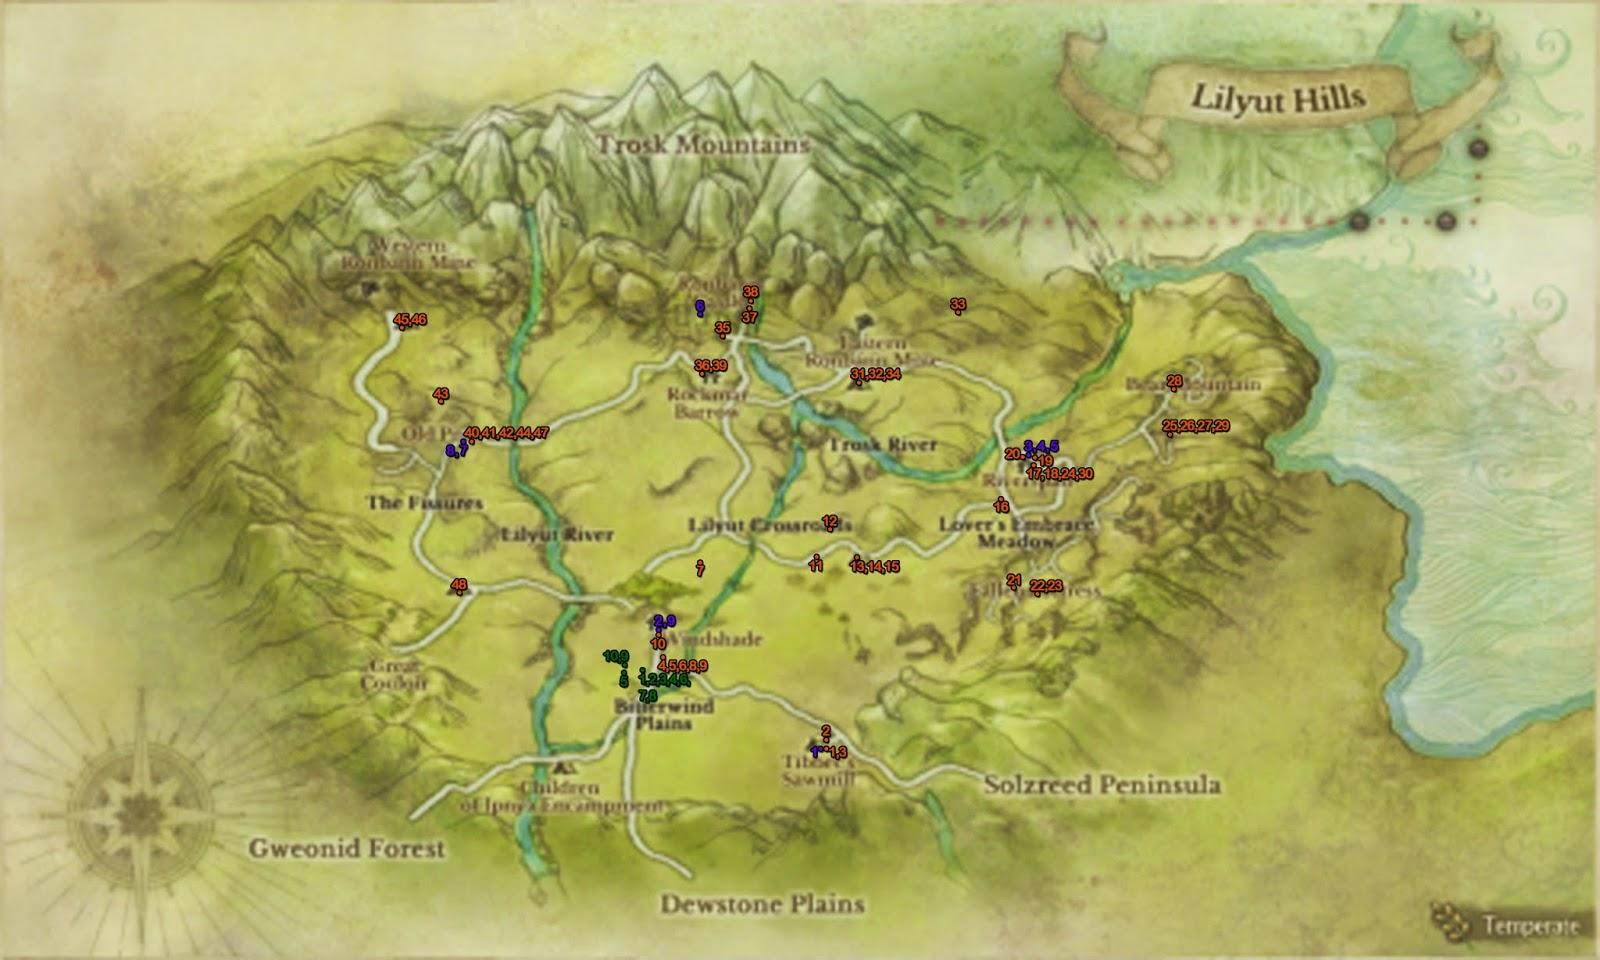 Fuji S Gameshop Archeage Quests Lilyut Hills Lv11 Lv15